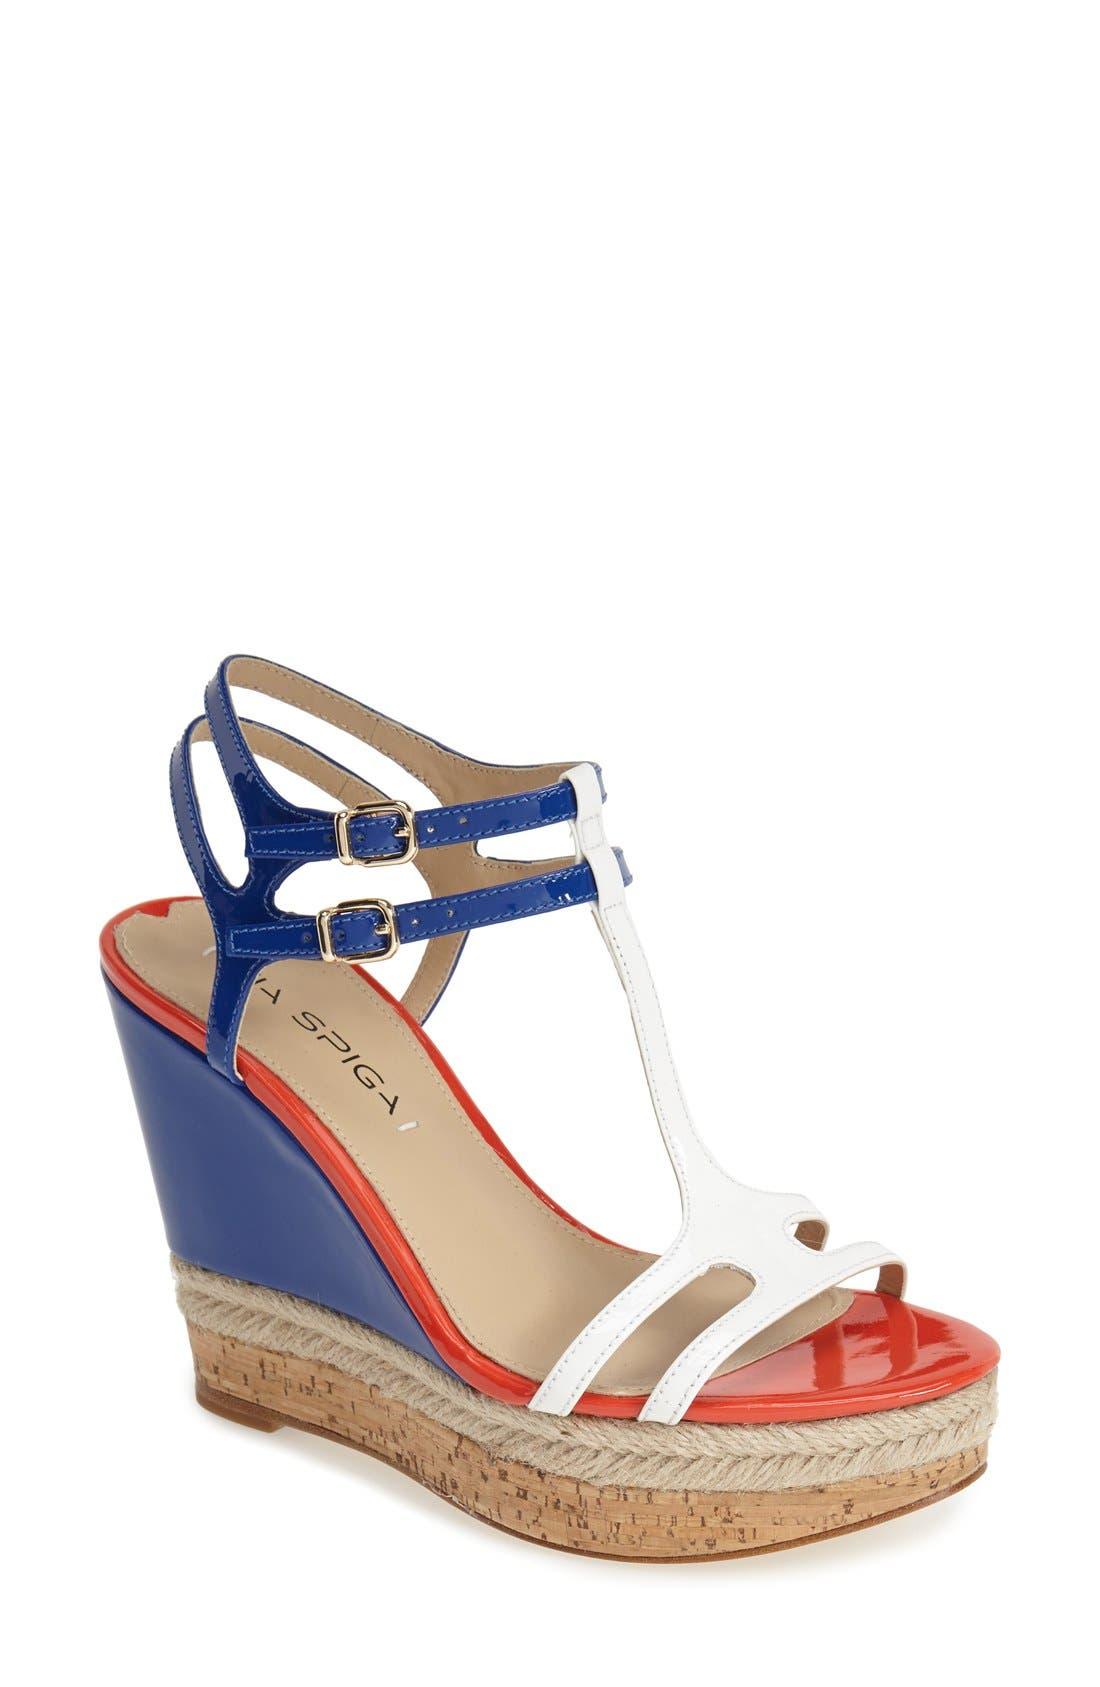 Main Image - Via Spiga 'Meza' Leather Dual Ankle Strap Platform Wedge (Women) (Nordstrom Exclusive)